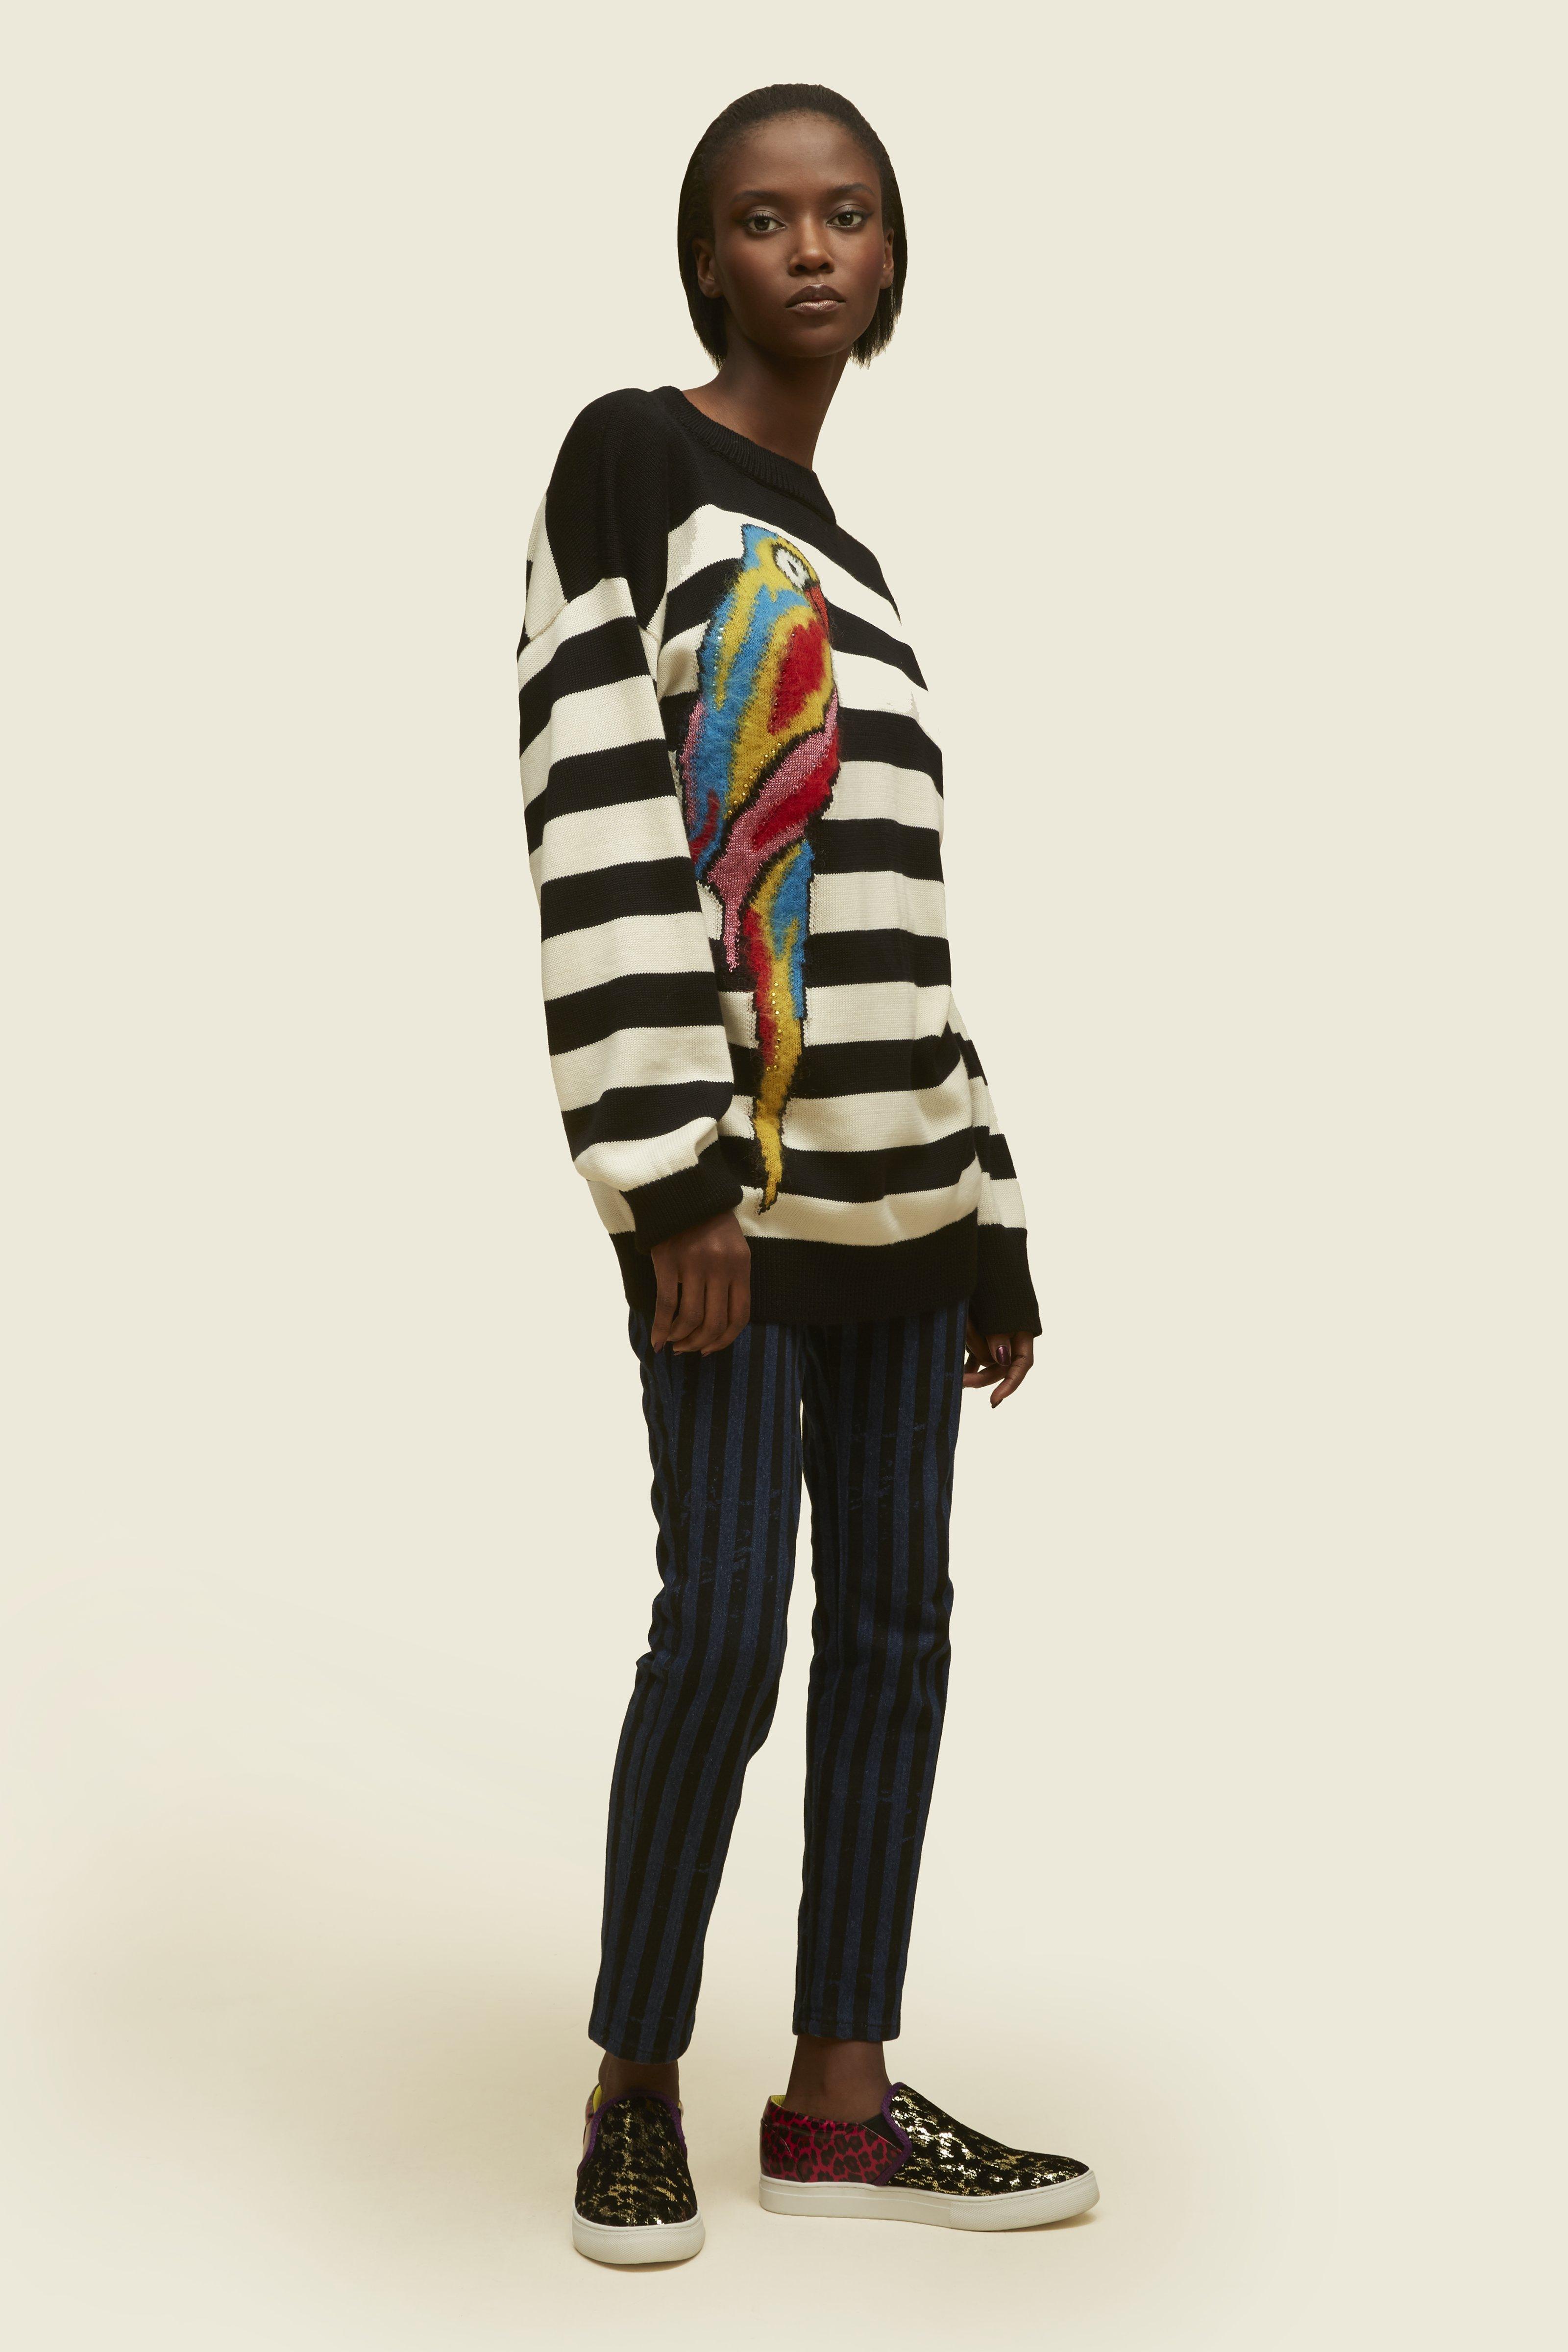 Women'S Striped Parrot Intarsia Knit Sweater In Black And White, Black Multi